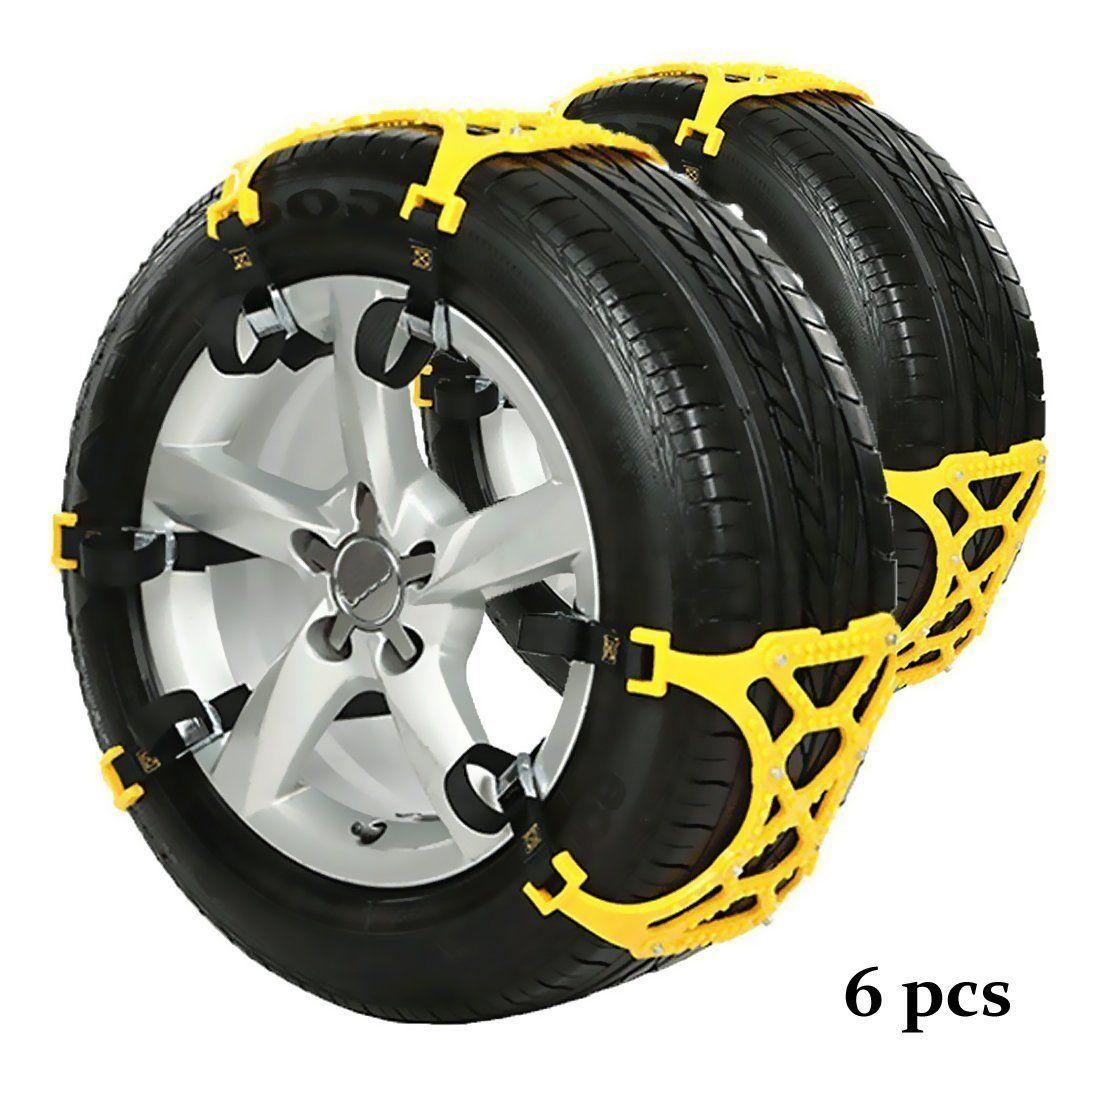 DINOKA 6 pcs/set Snow Chains of Car Chain Tire Emergency